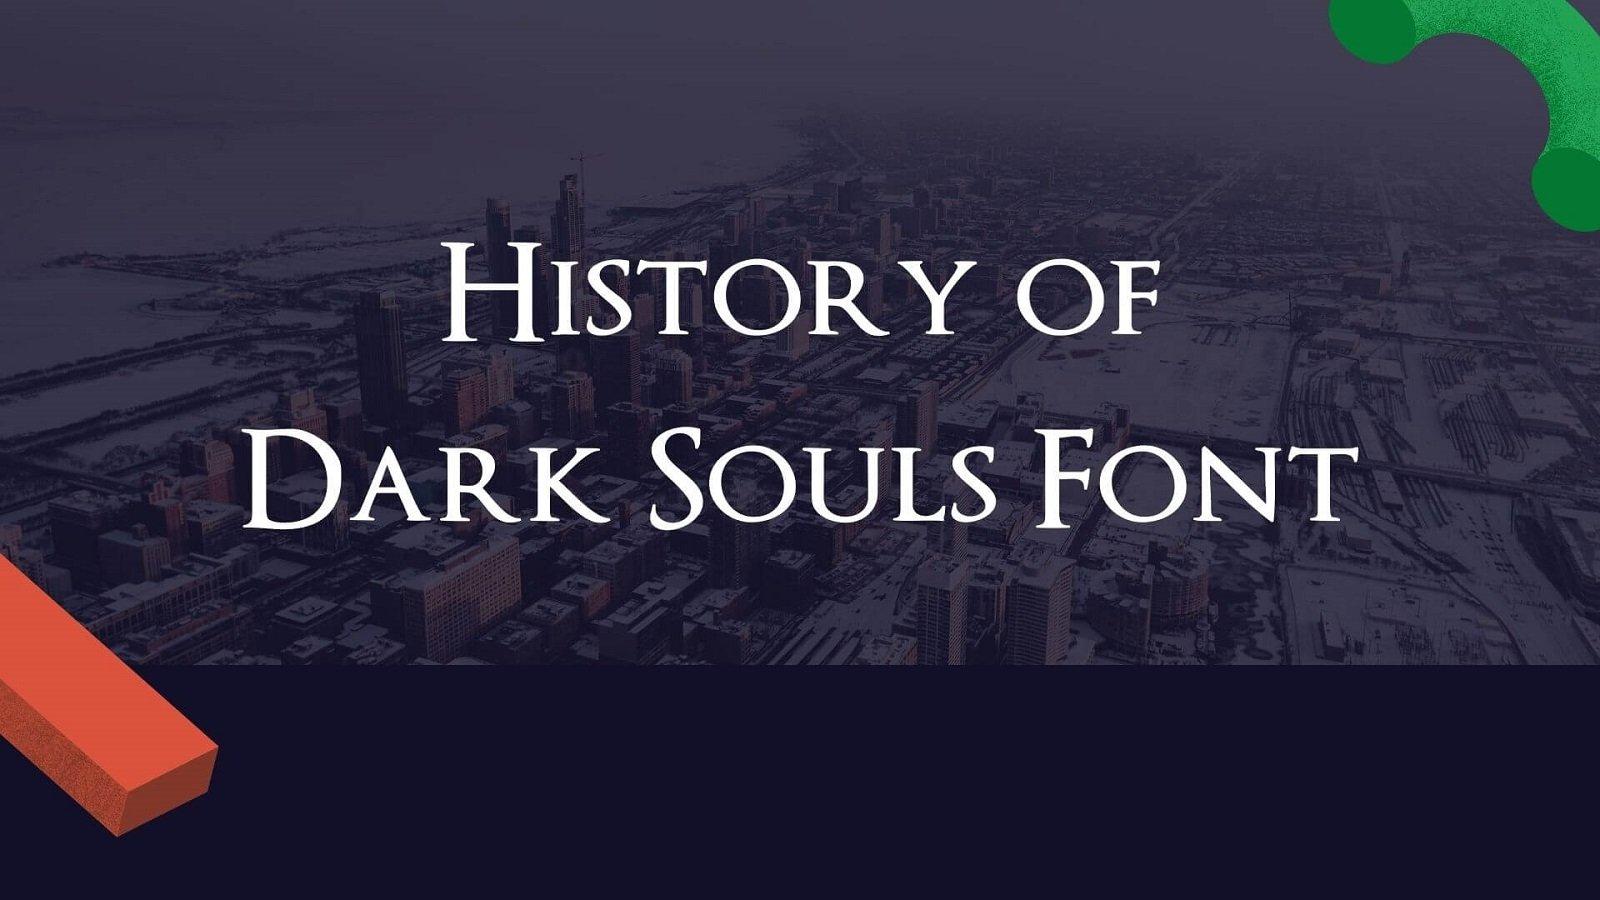 History of Dark Souls Font